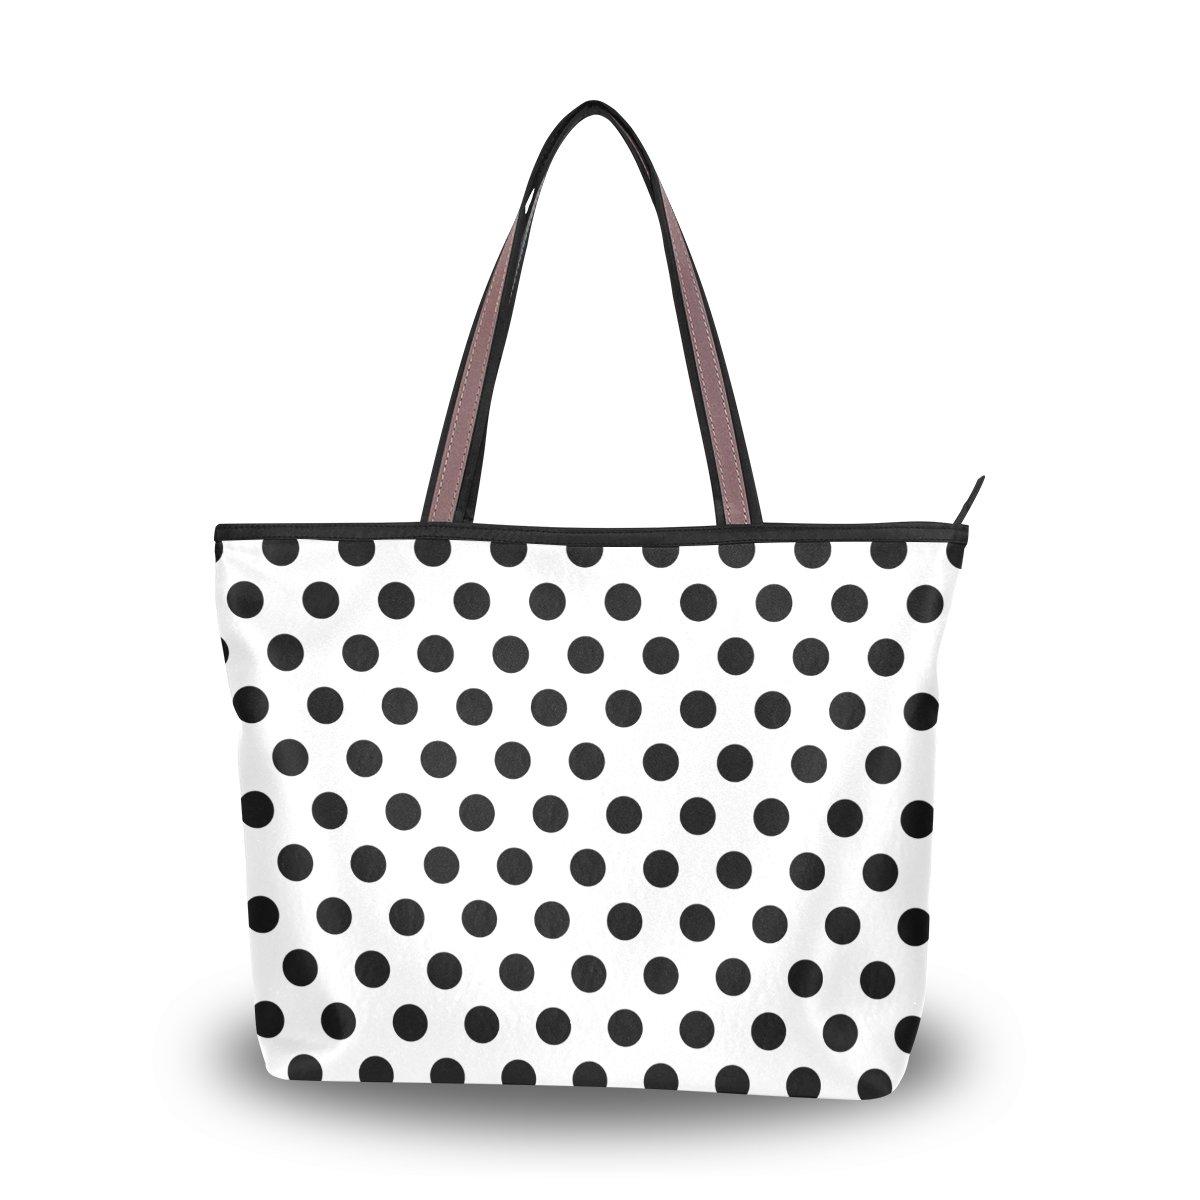 imobaby Seamless Black And White Dots Pattern Women Large Tote Shoulder BagsTop Handle Handbag TE121